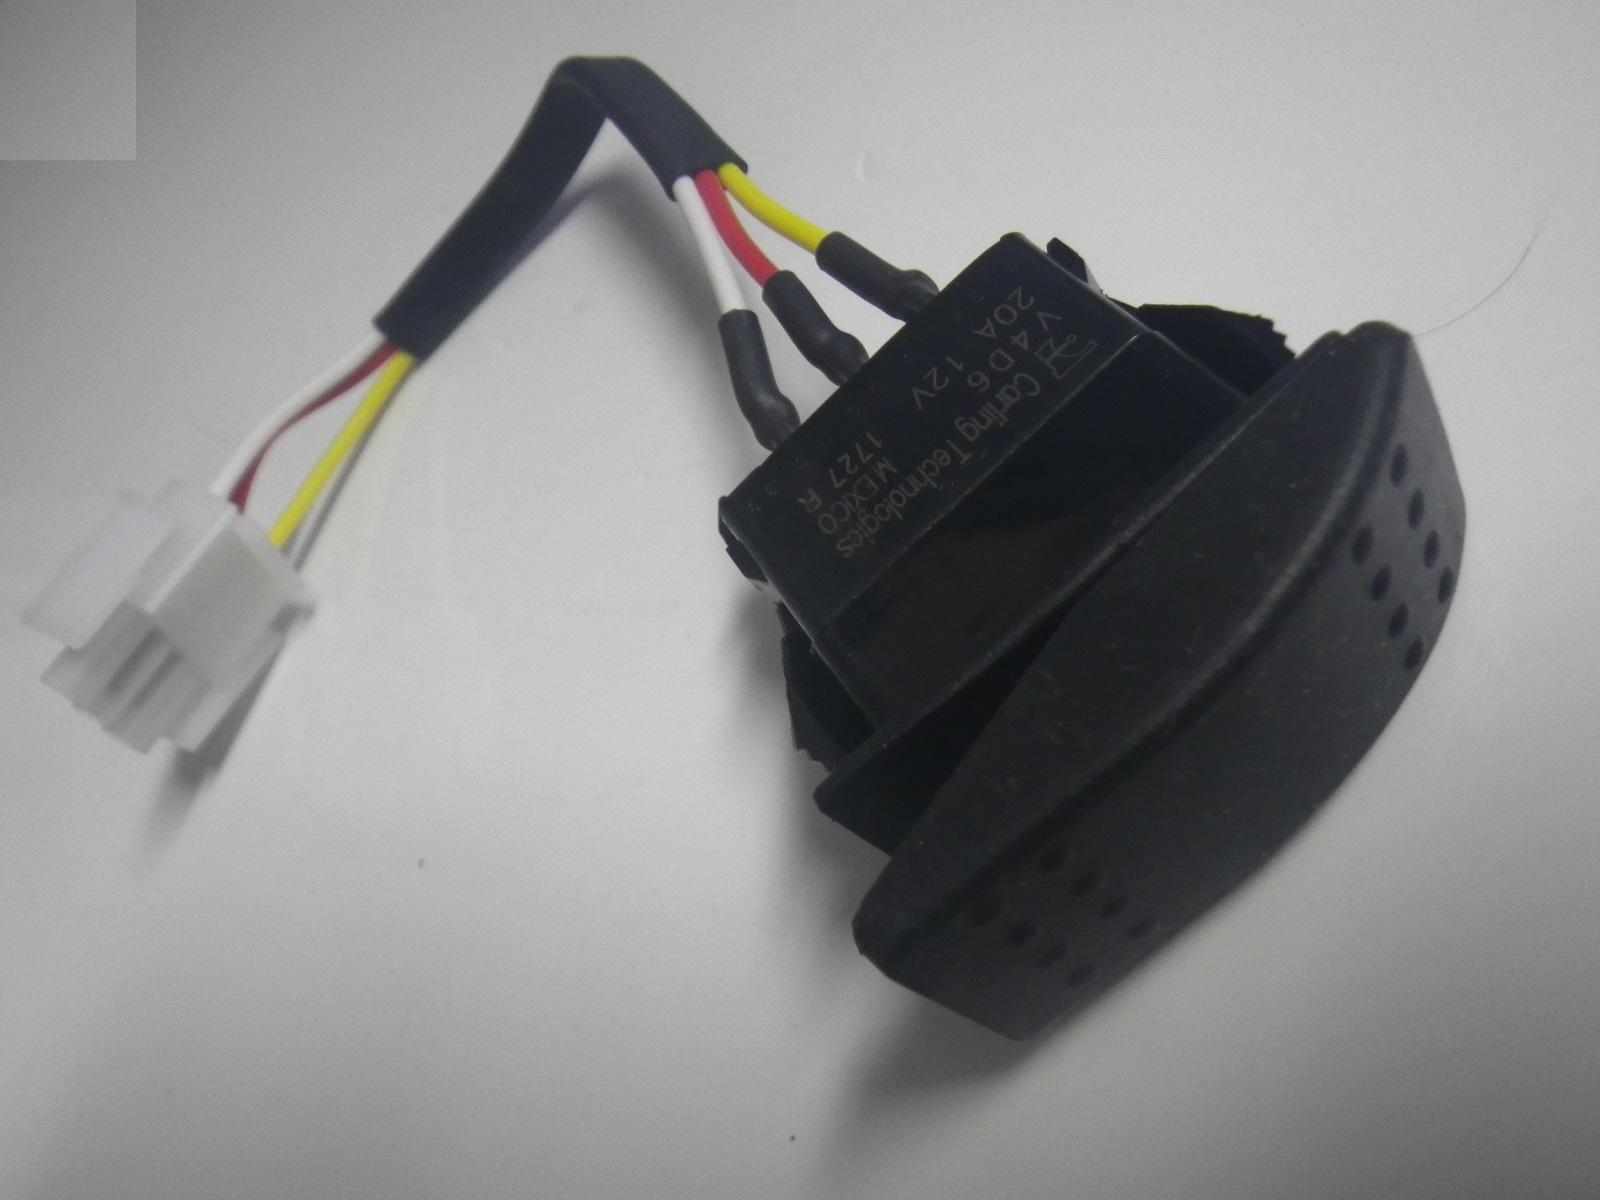 hight resolution of yamaha g16 g19 g22 g23 1996 up 48v electric golf cart forward reverse switch